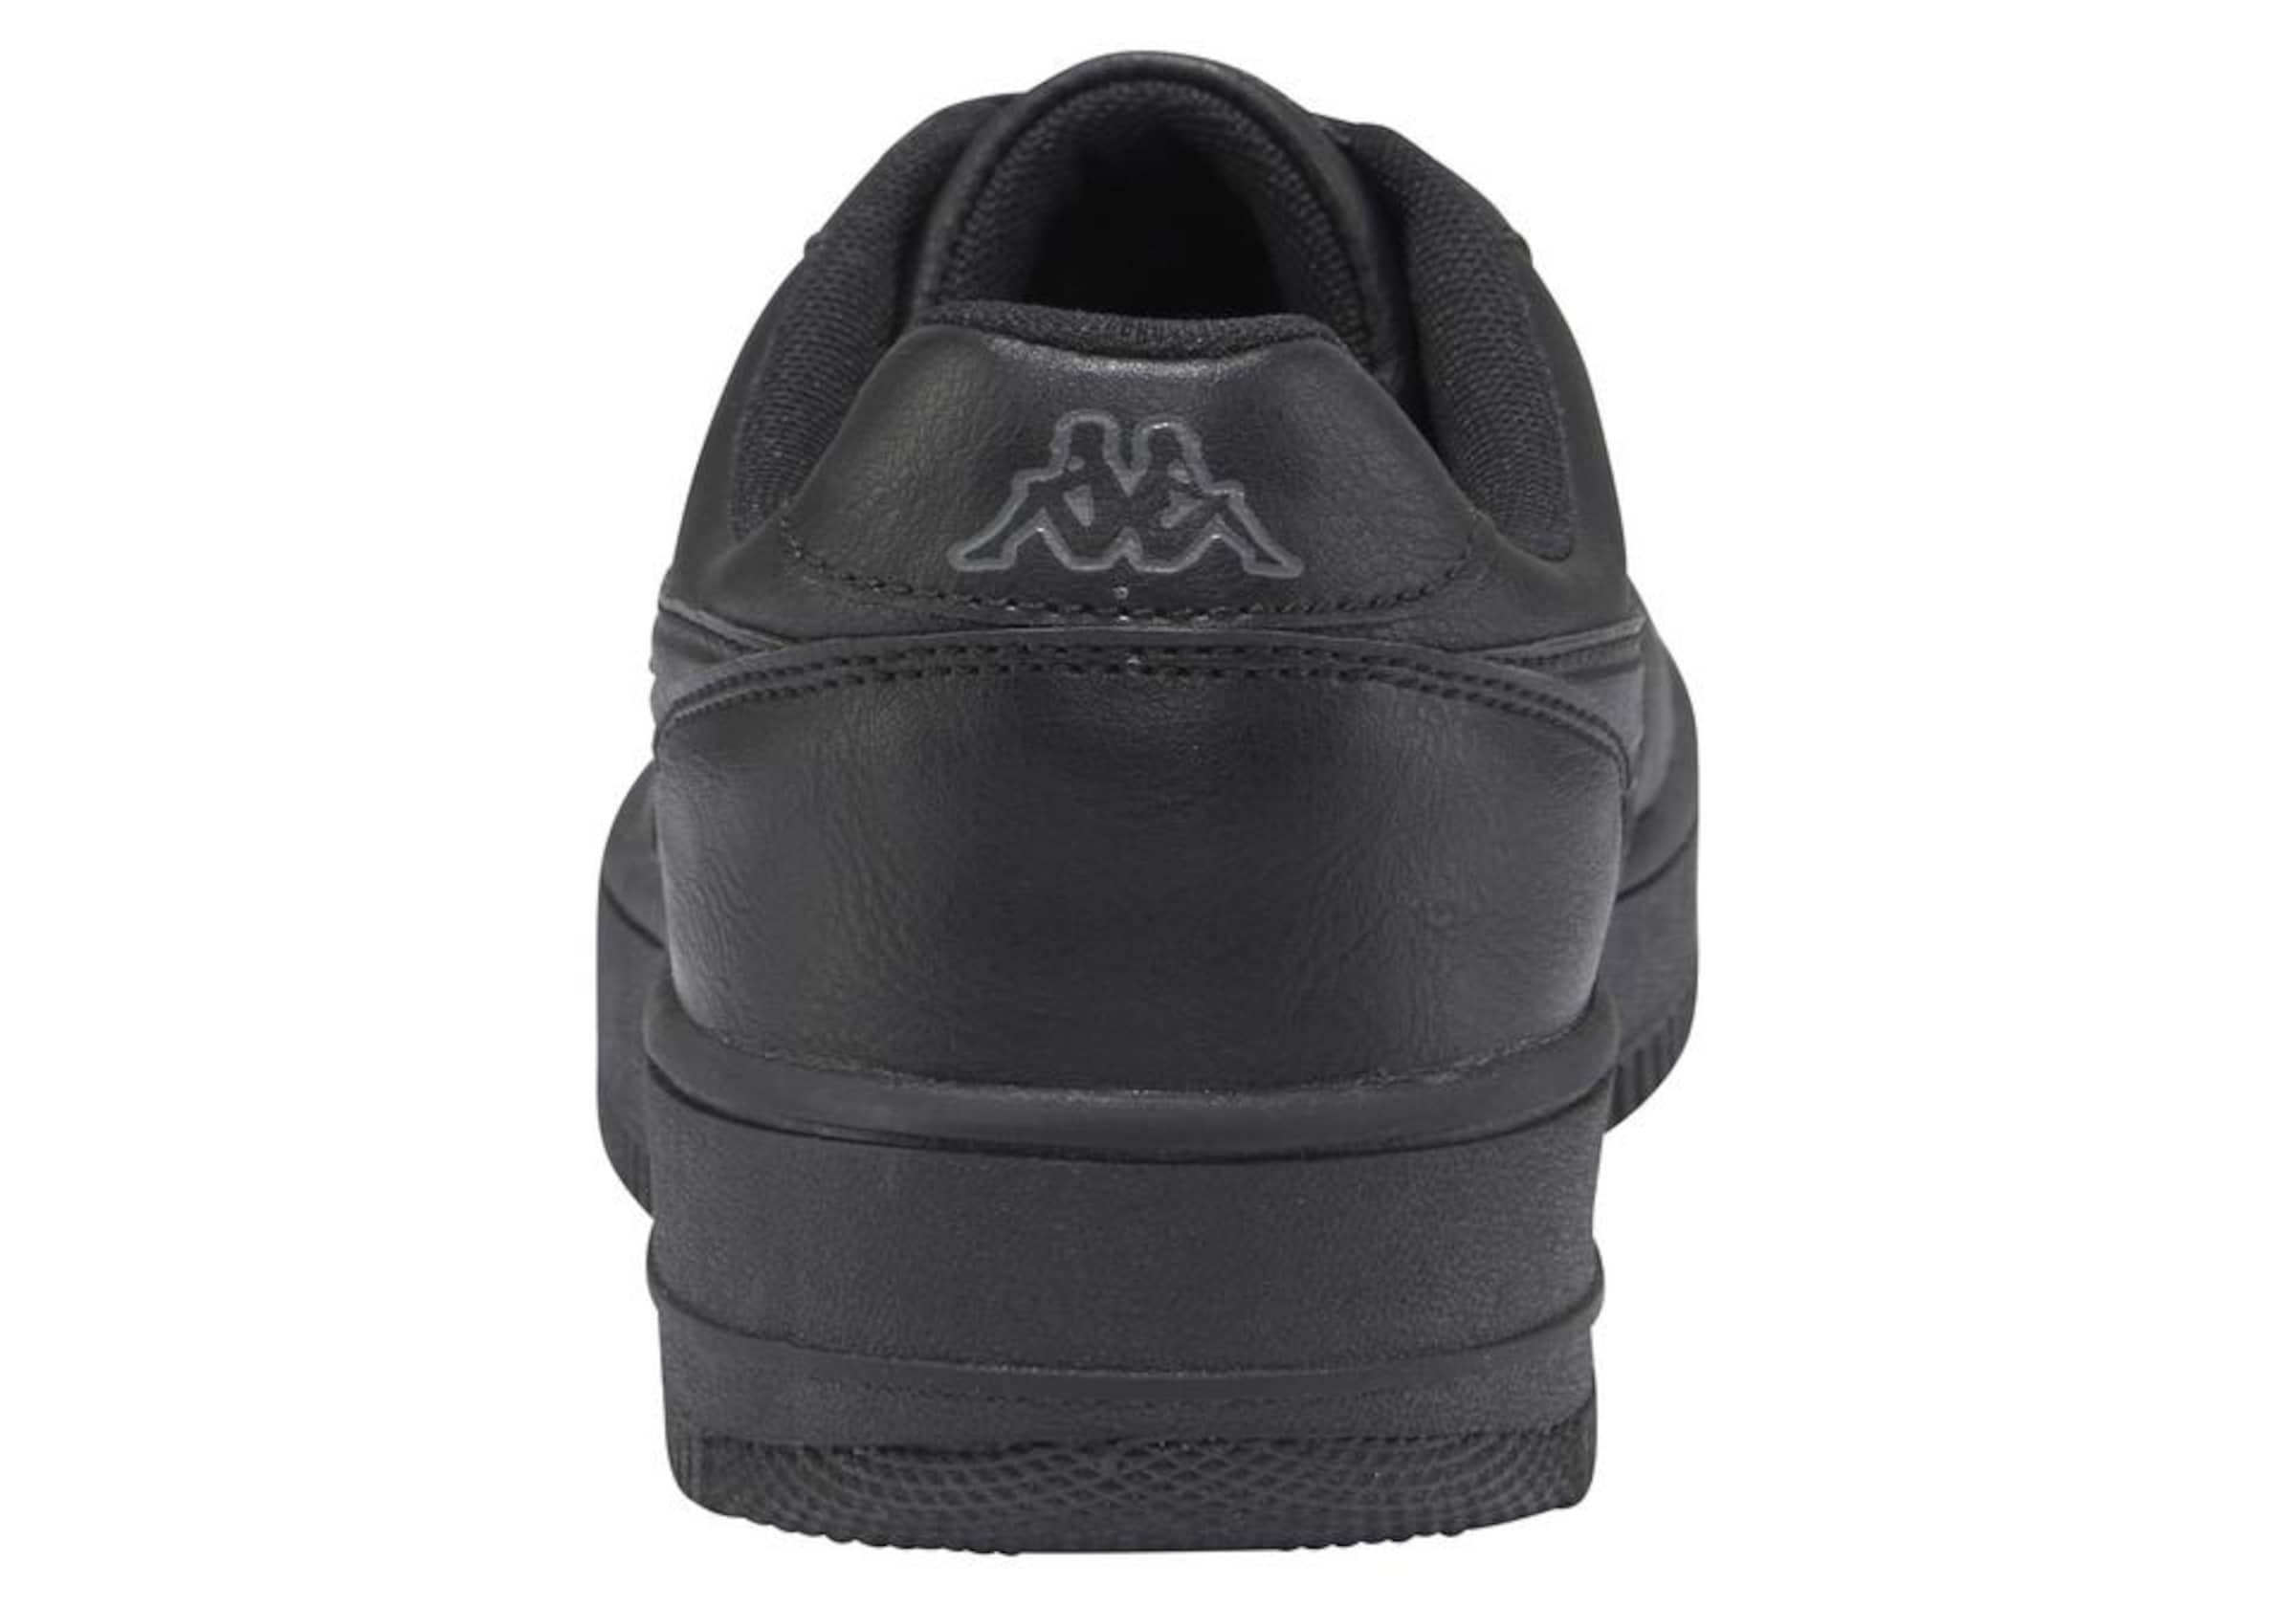 Kappa In Schwarz In Sneaker 'bash' Sneaker Schwarz Kappa 'bash' oWrxBedC